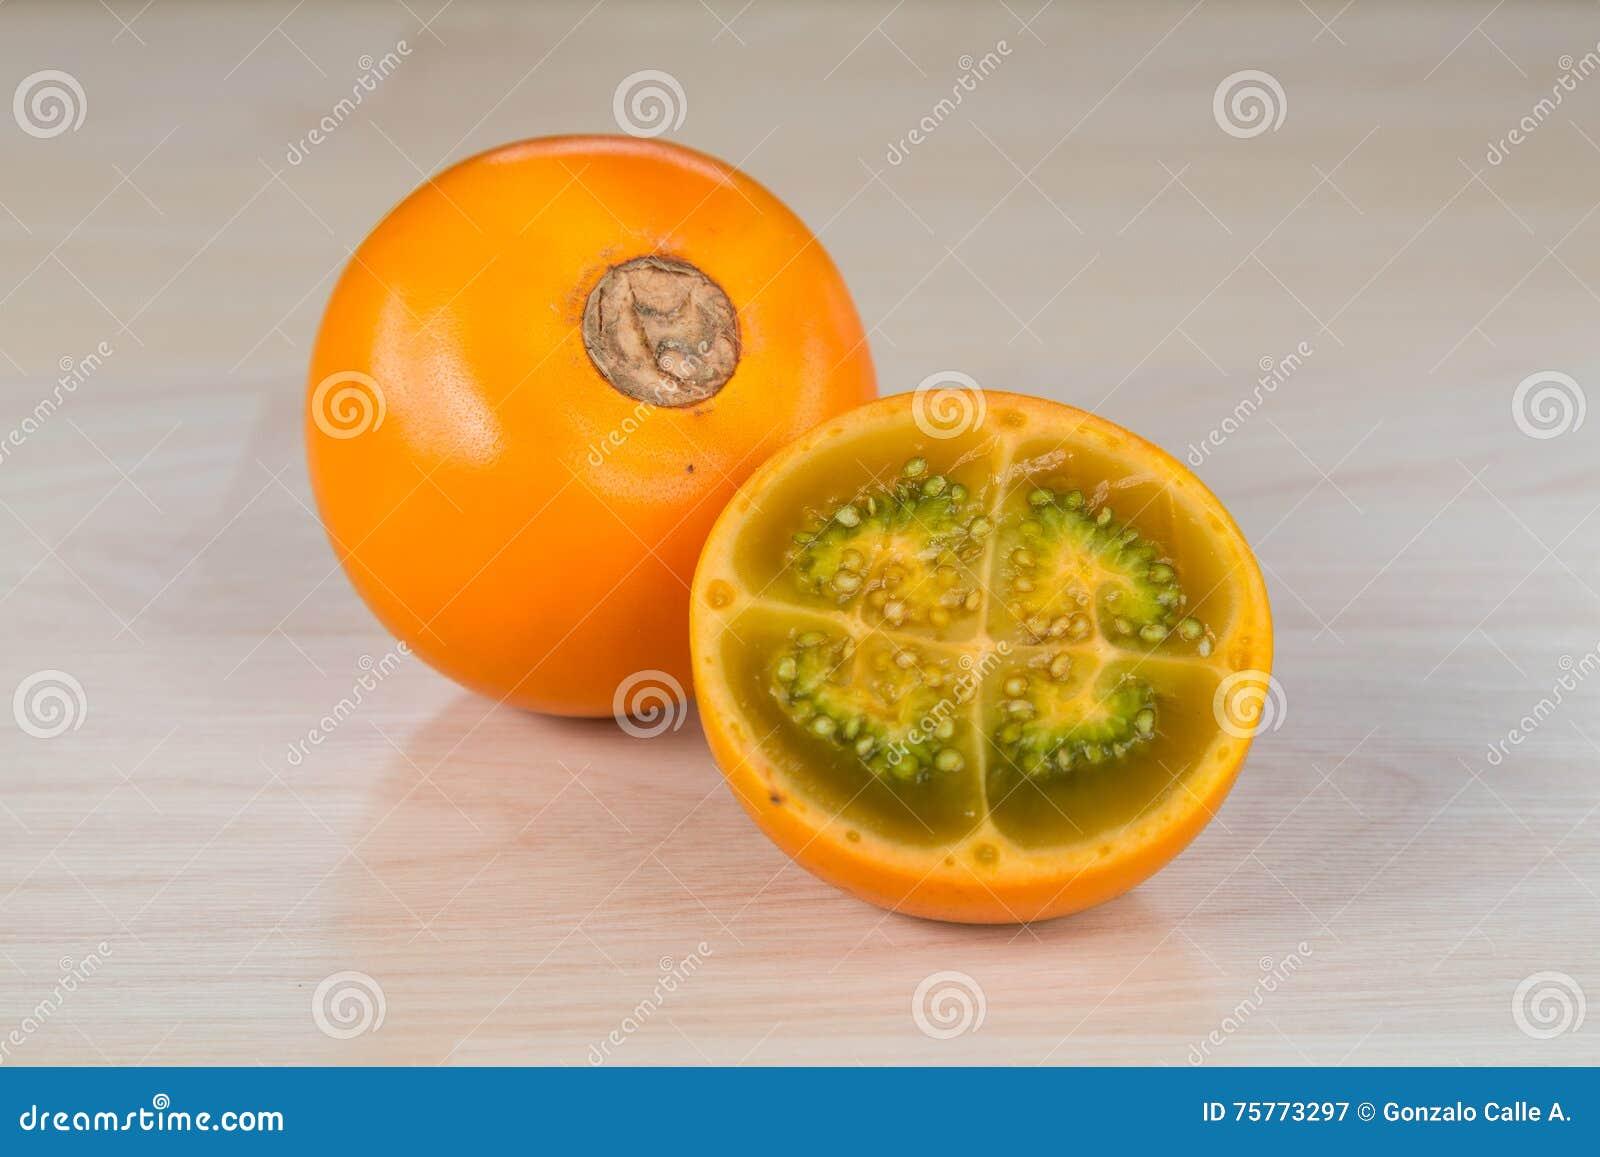 Best All Natural Orange Juice